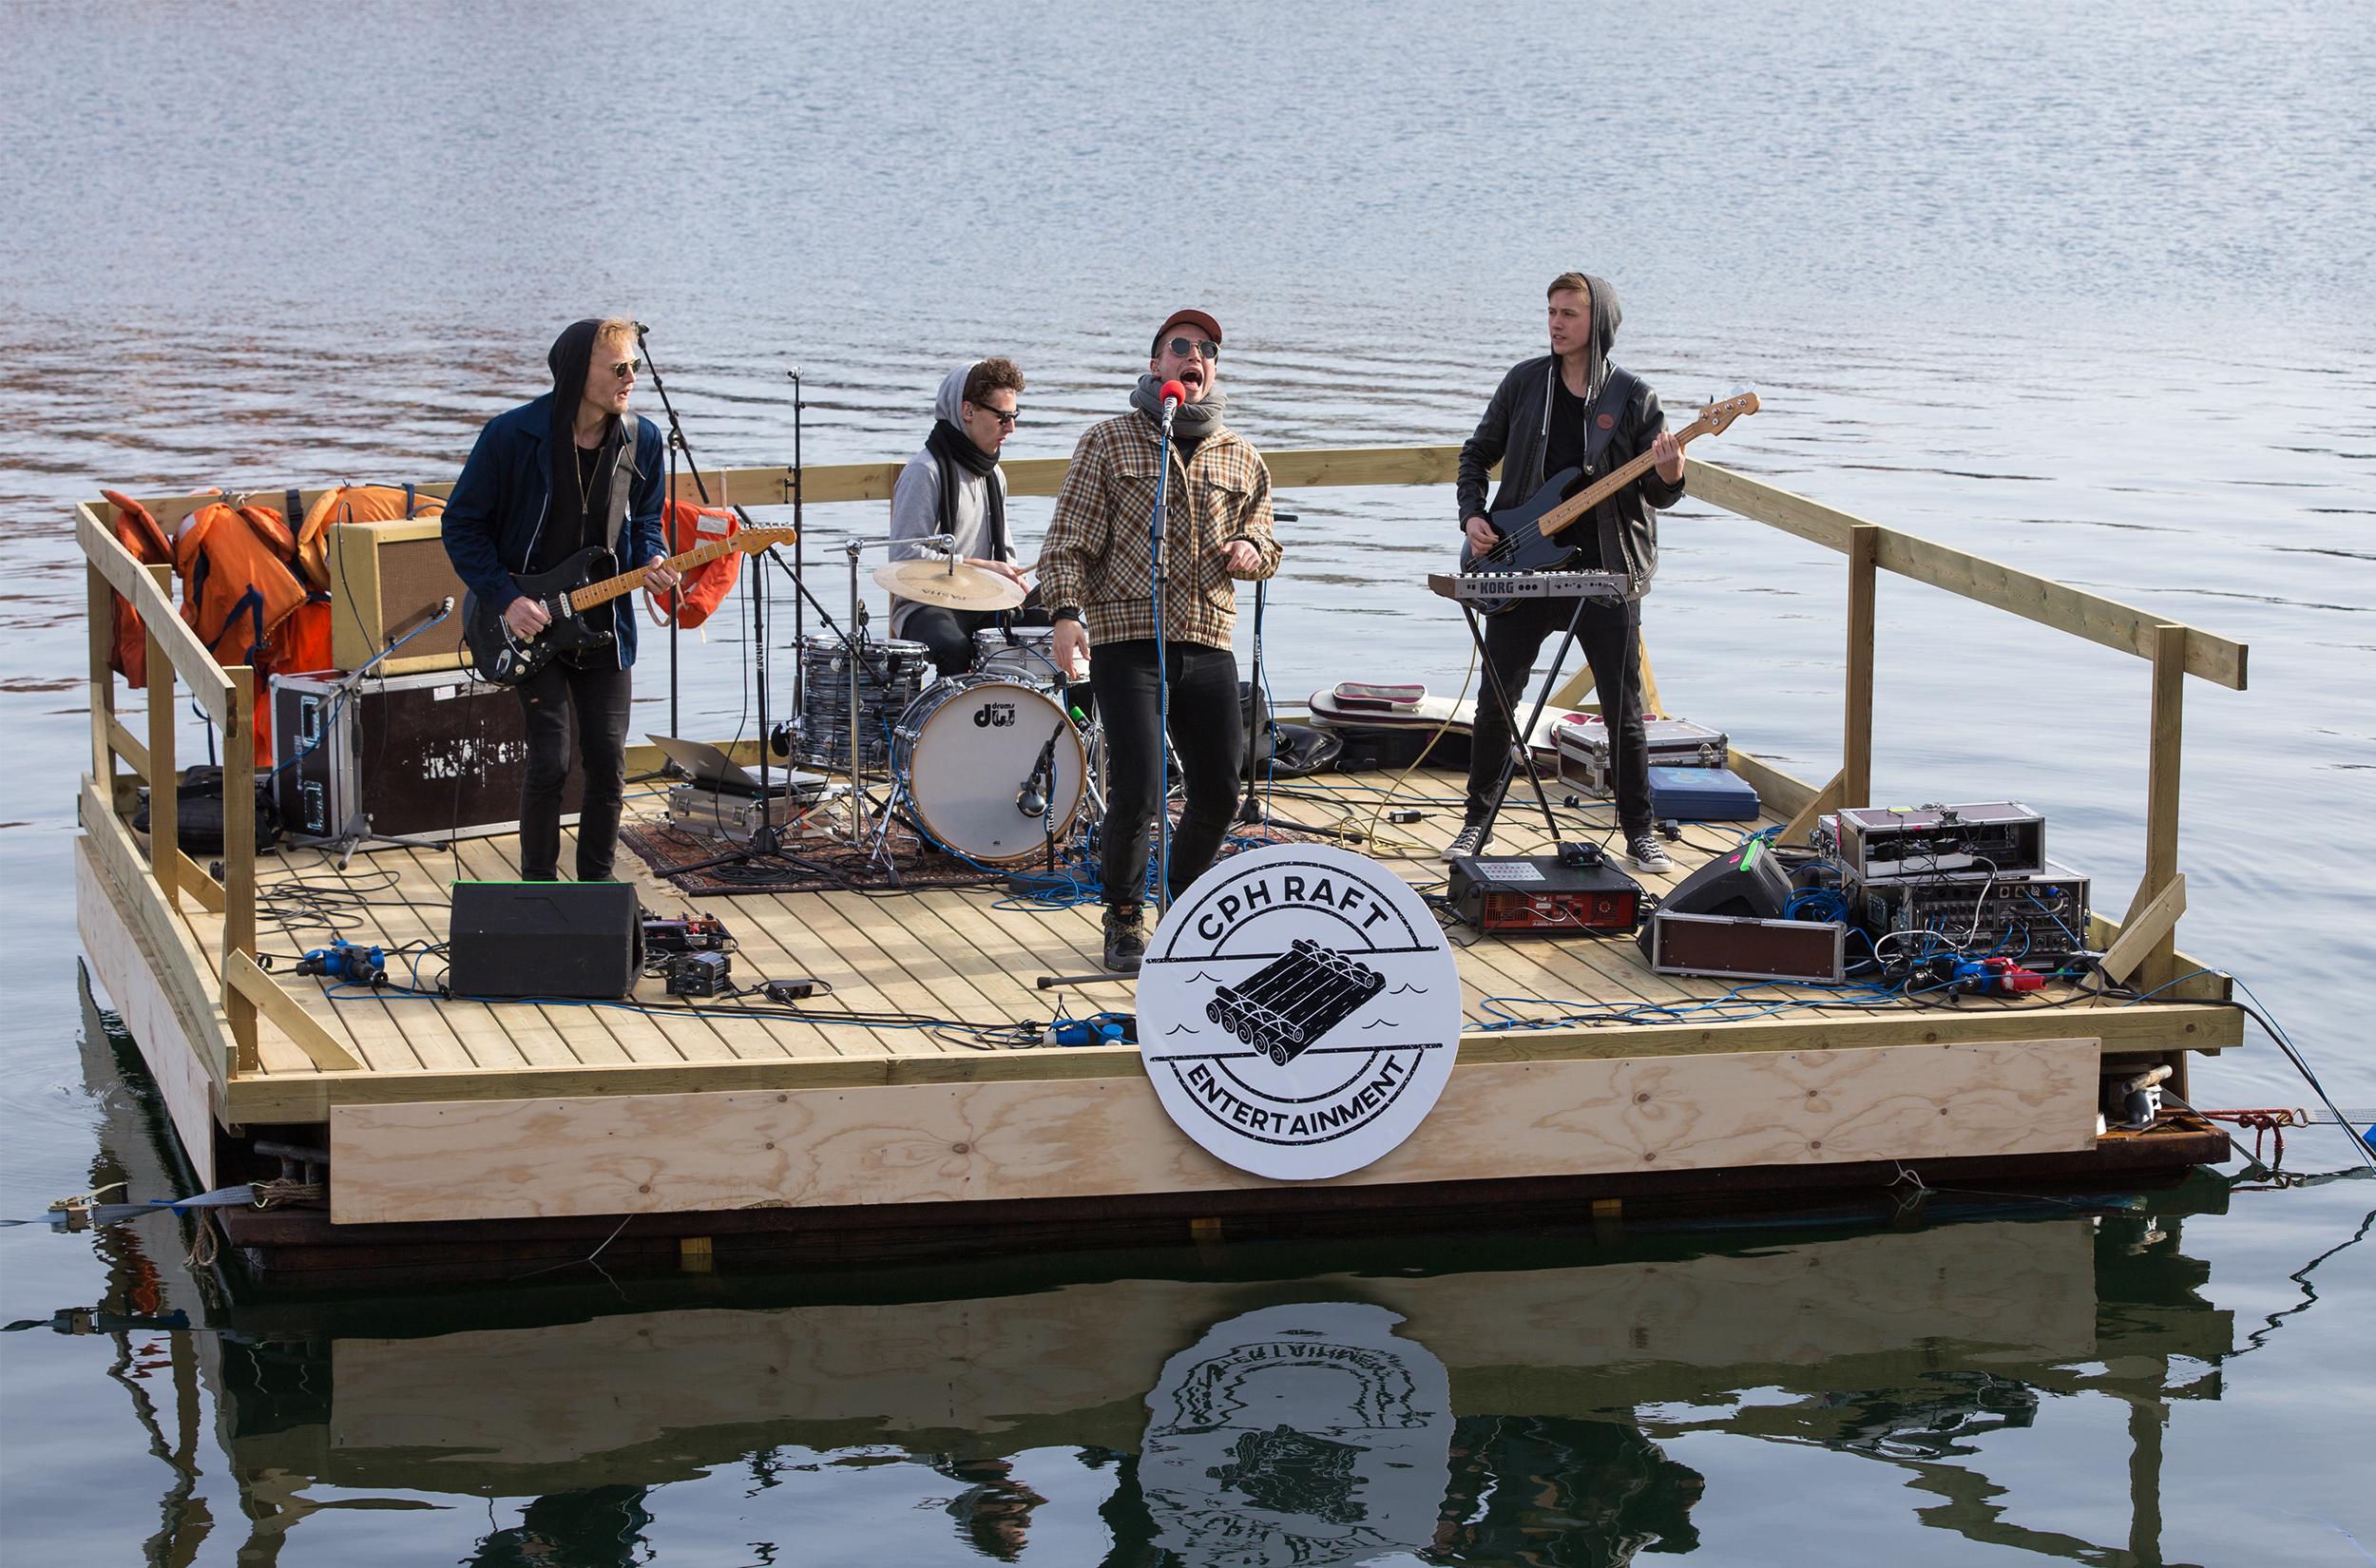 Winter Raft Concert / Foto: Thomas Rousing